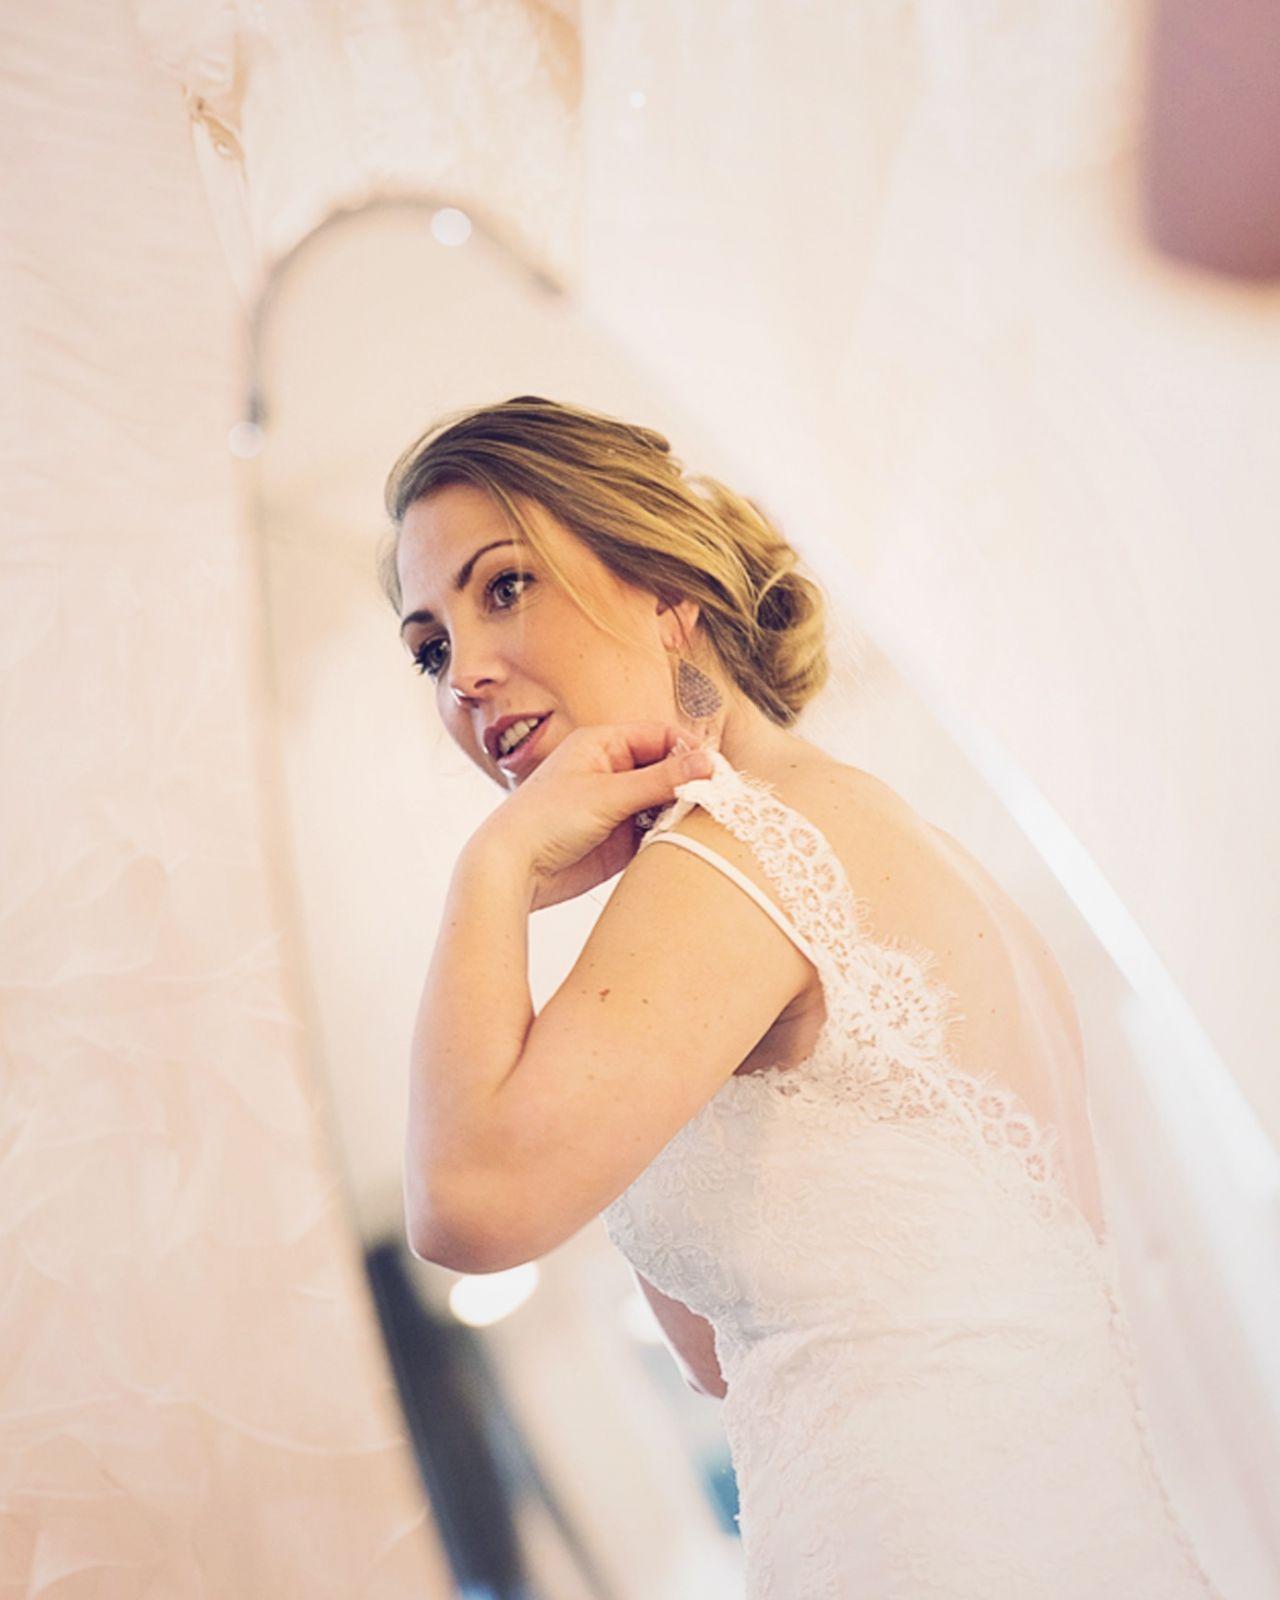 advies kopen bruidsjurk